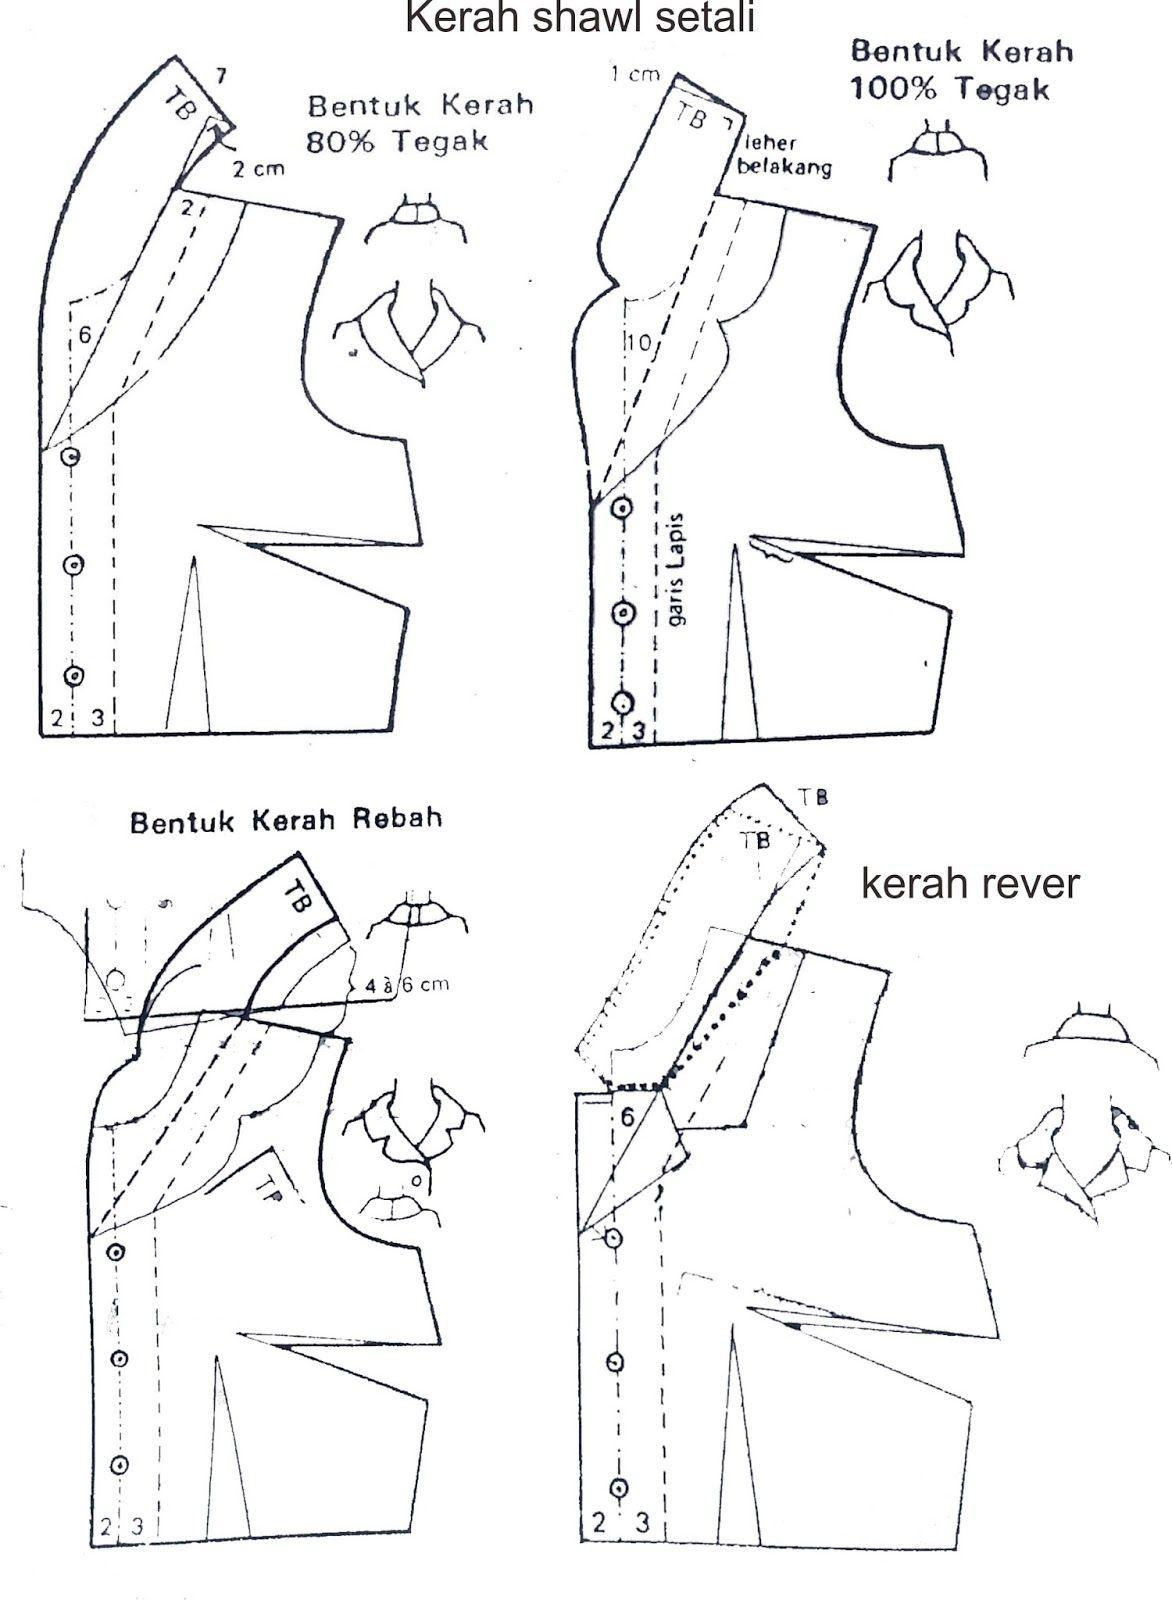 Kerah selendang setali atau kerah shawl setali | Lecciones De ...